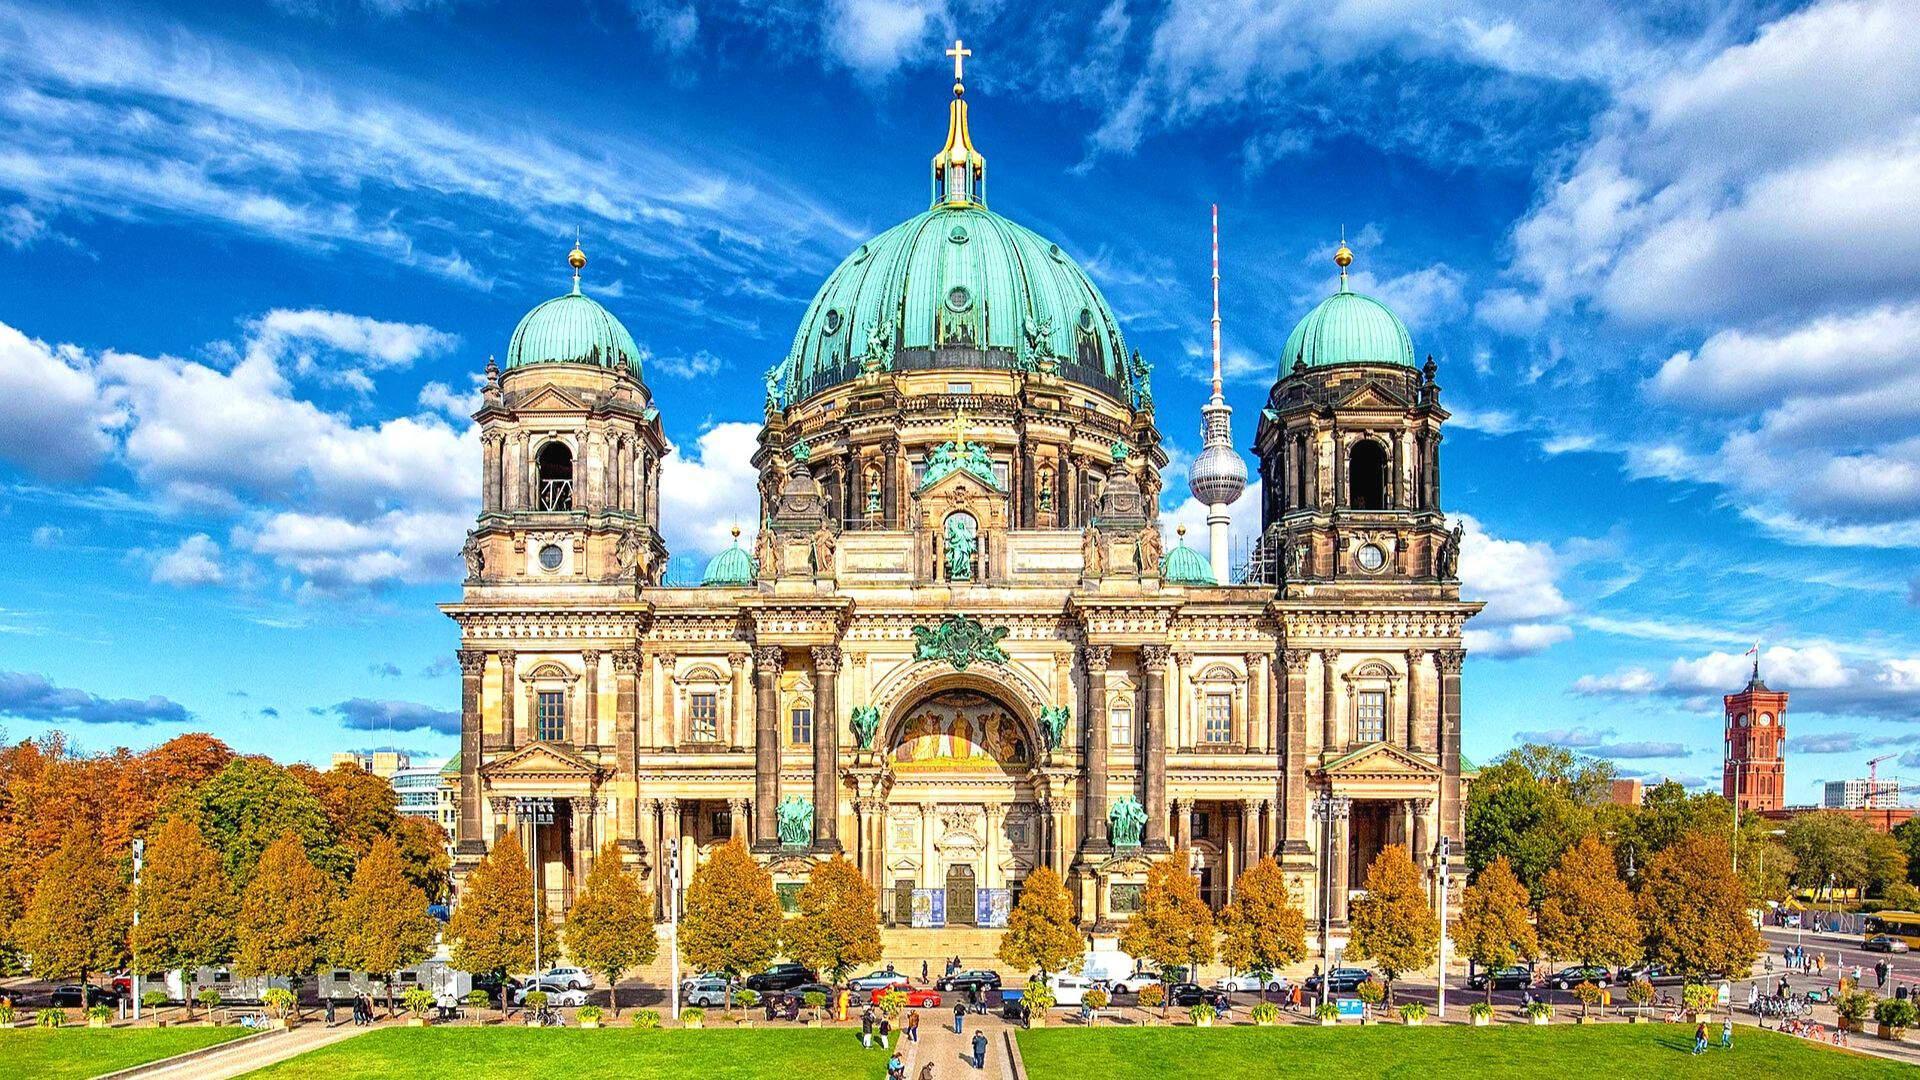 Didingoji Berlyno katedra – architektūros šedevras, pakerintis grožiu